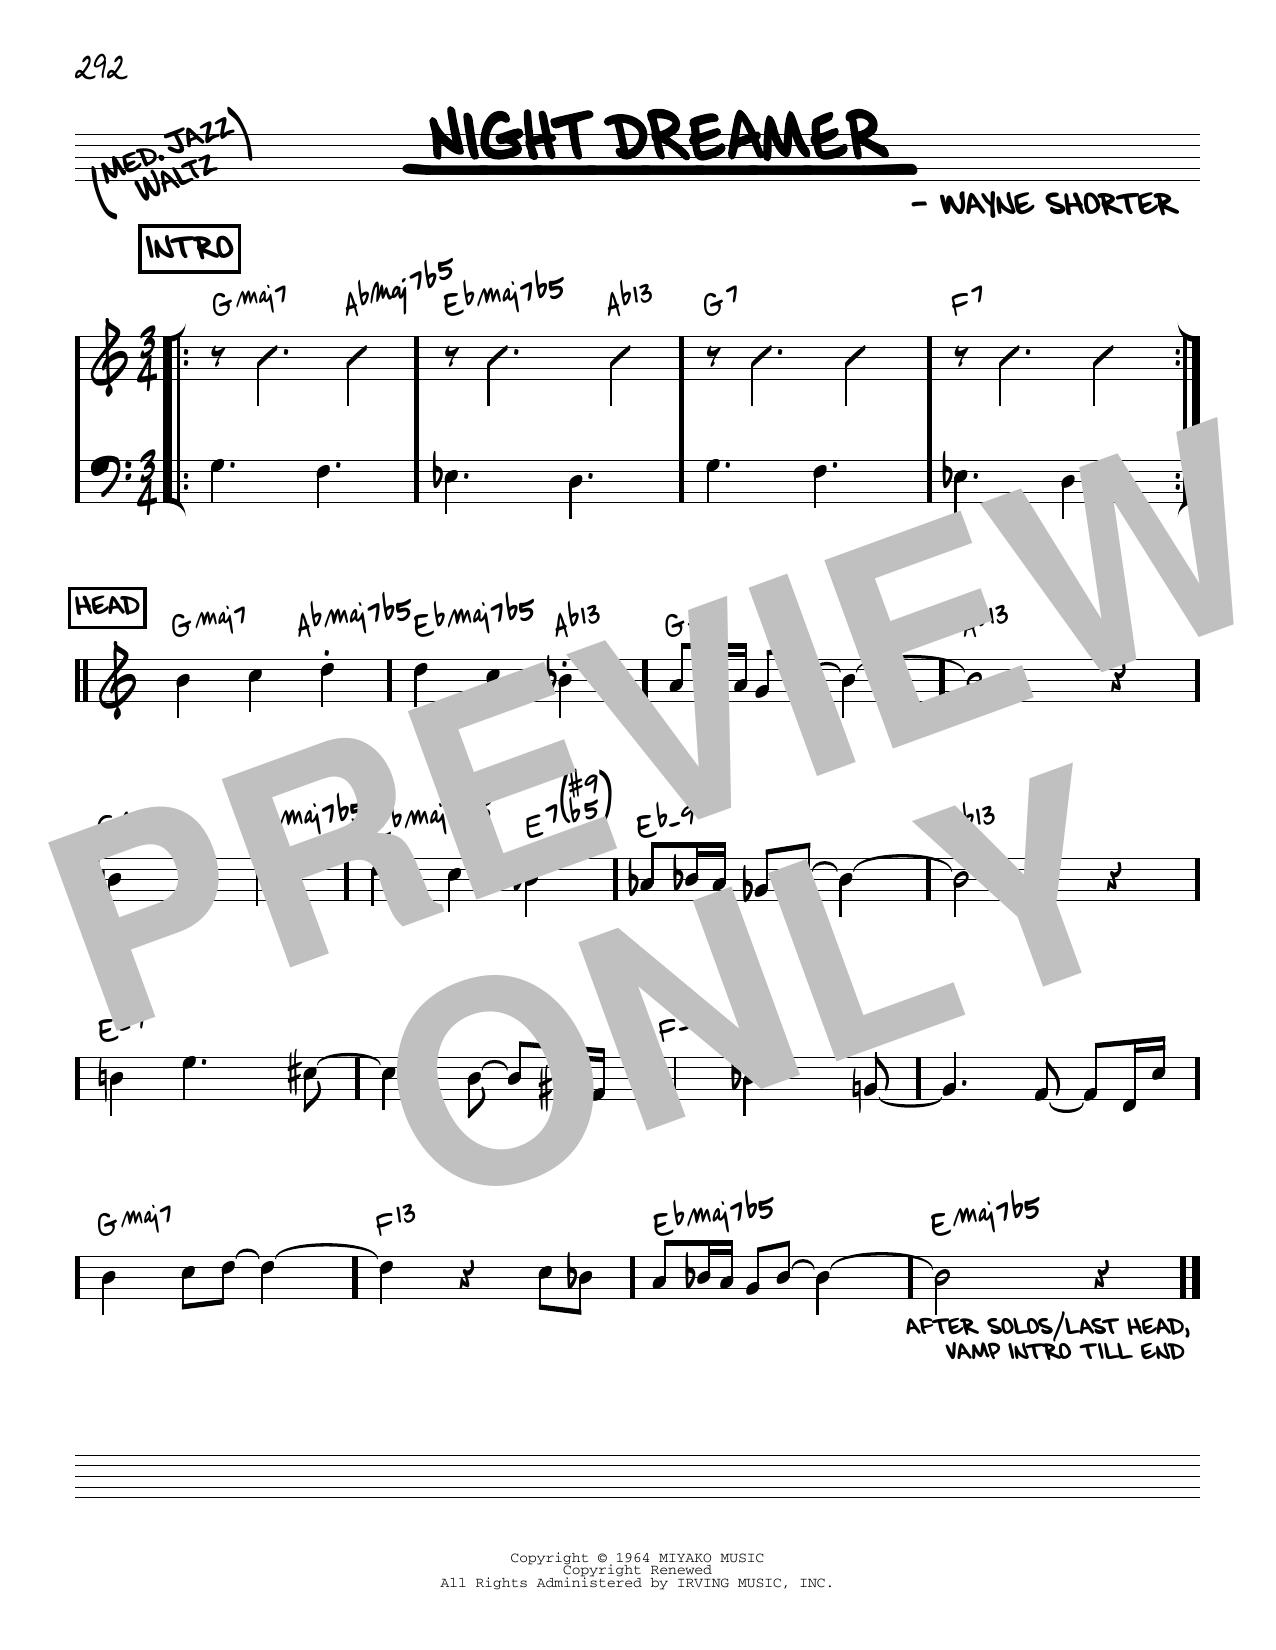 Wayne Shorter Night Dreamer [Reharmonized version] (arr. Jack Grassel) sheet music notes printable PDF score